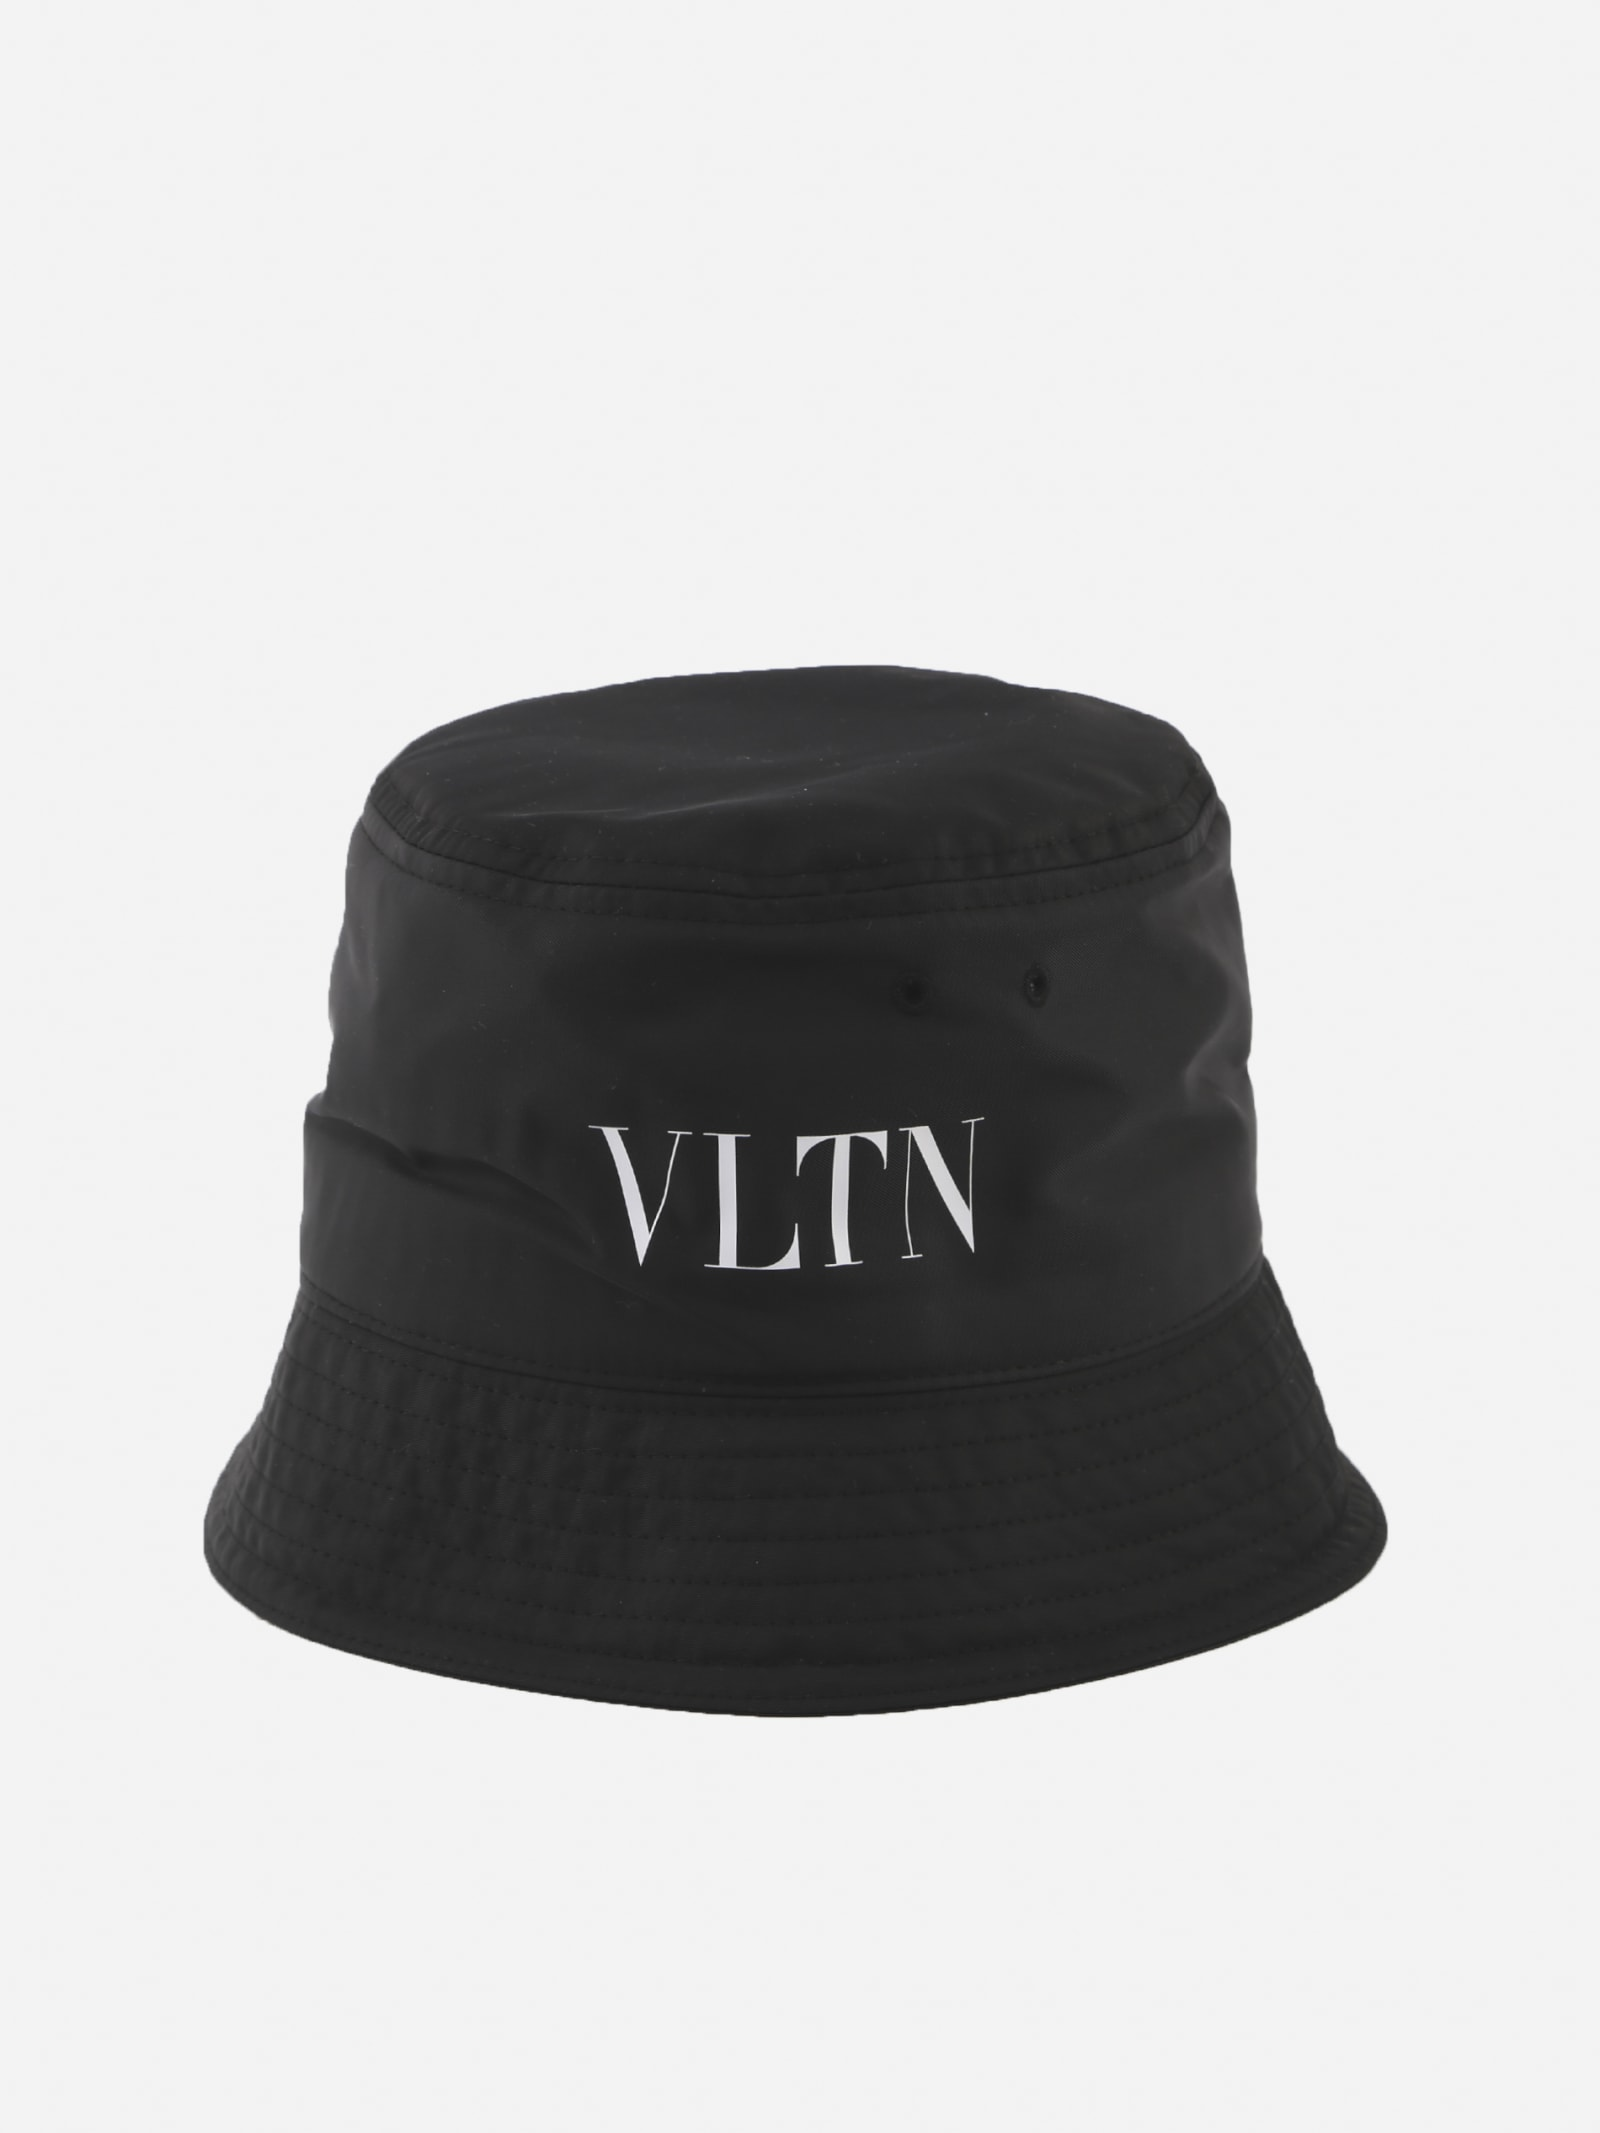 Valentino Garavani Vltn Black Bucket Hat